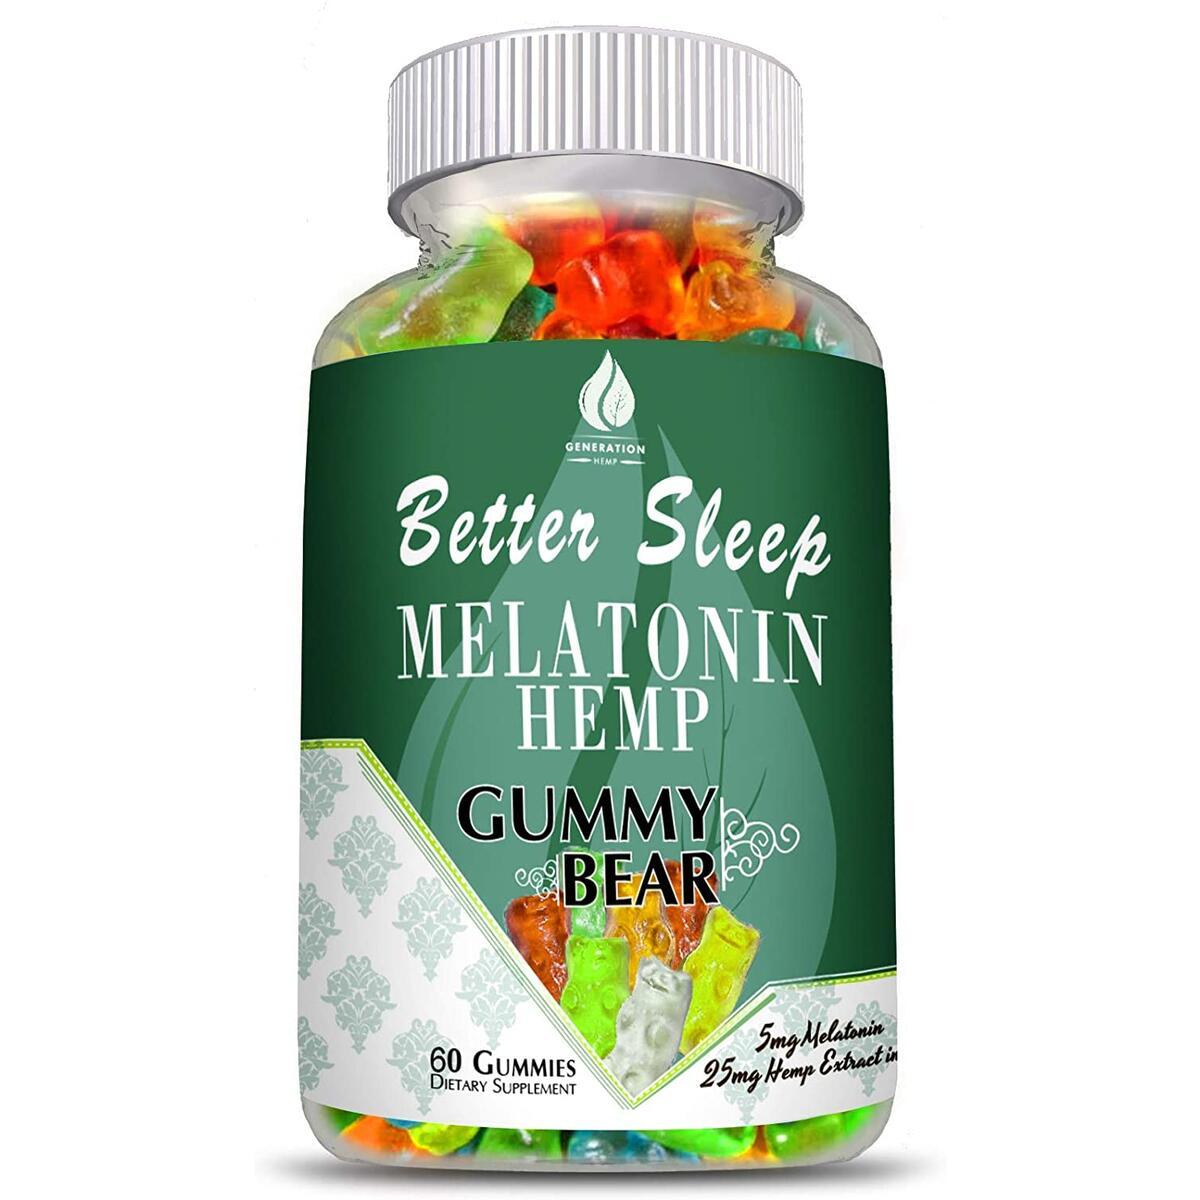 Melatonin Hemp Gummies for Sleep, Anxiety and Stress Relief. 5mg Melatonin + 750mg of 100% Pure Organic Hemp Extract in Every Gummy. #1 Natural Sleep Aid to Promote restful Sleep -60 Servings